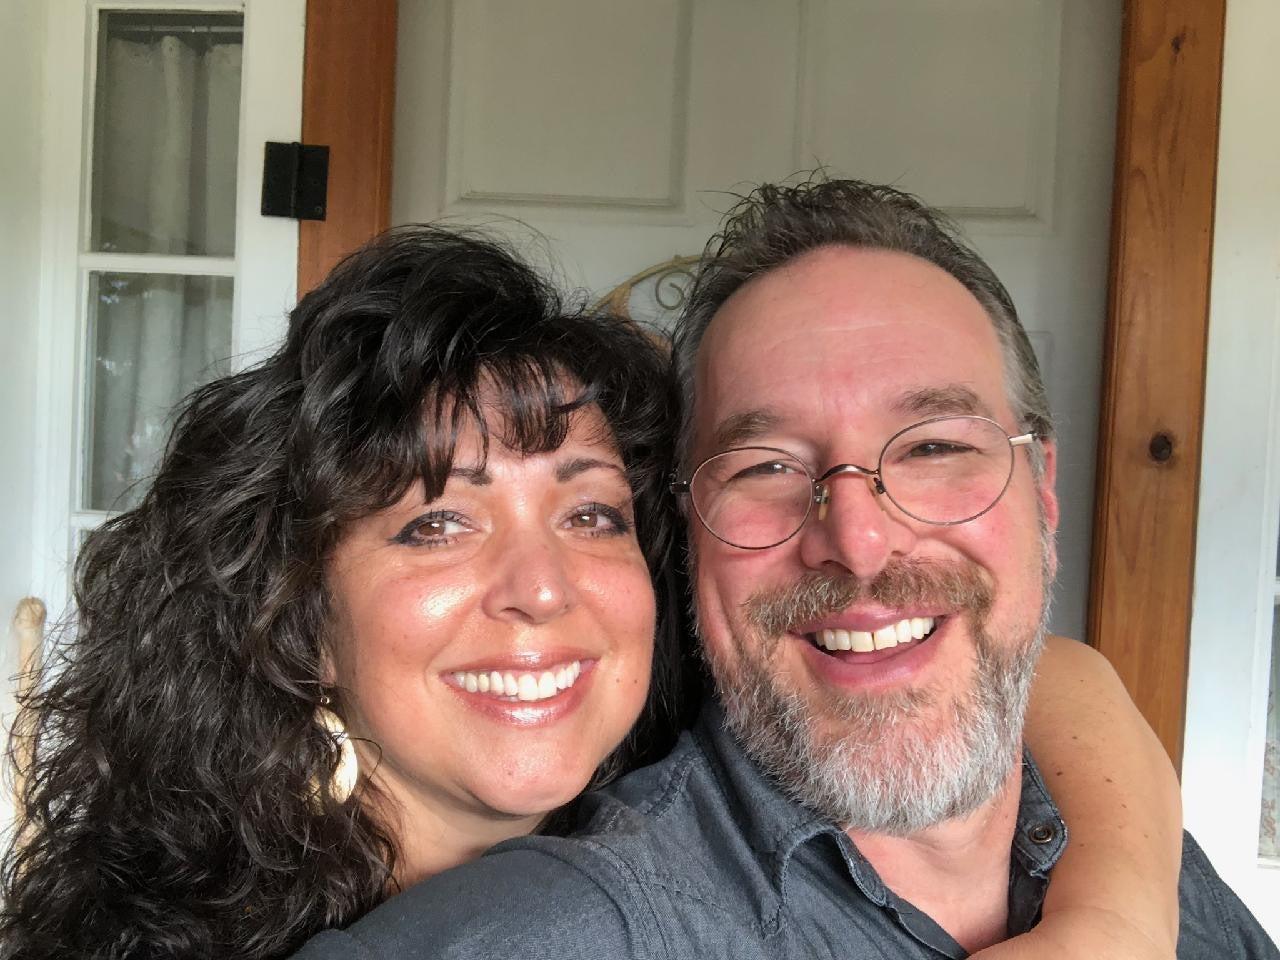 Bryan-and-Wife.JPG